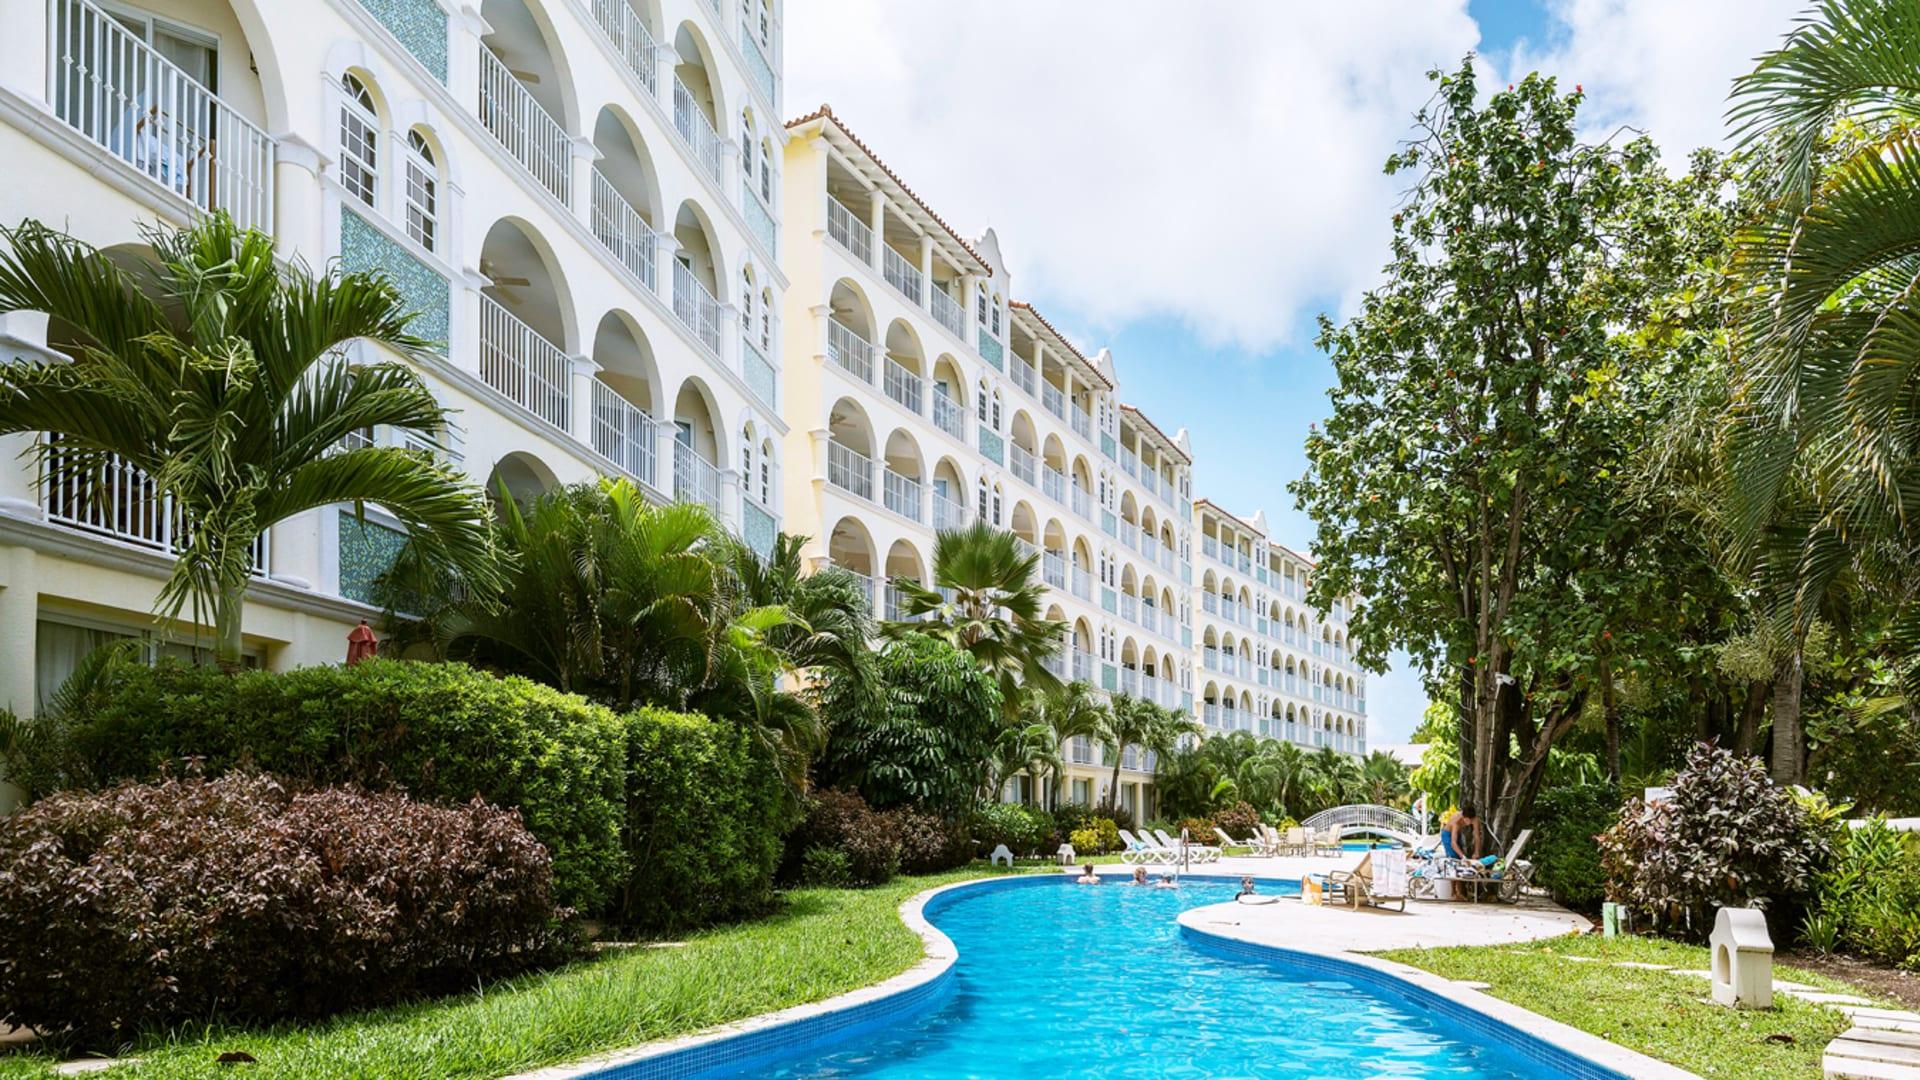 Palm Beach No 104 • Apartment • Barbados Luxury Homes & Real Estate ...